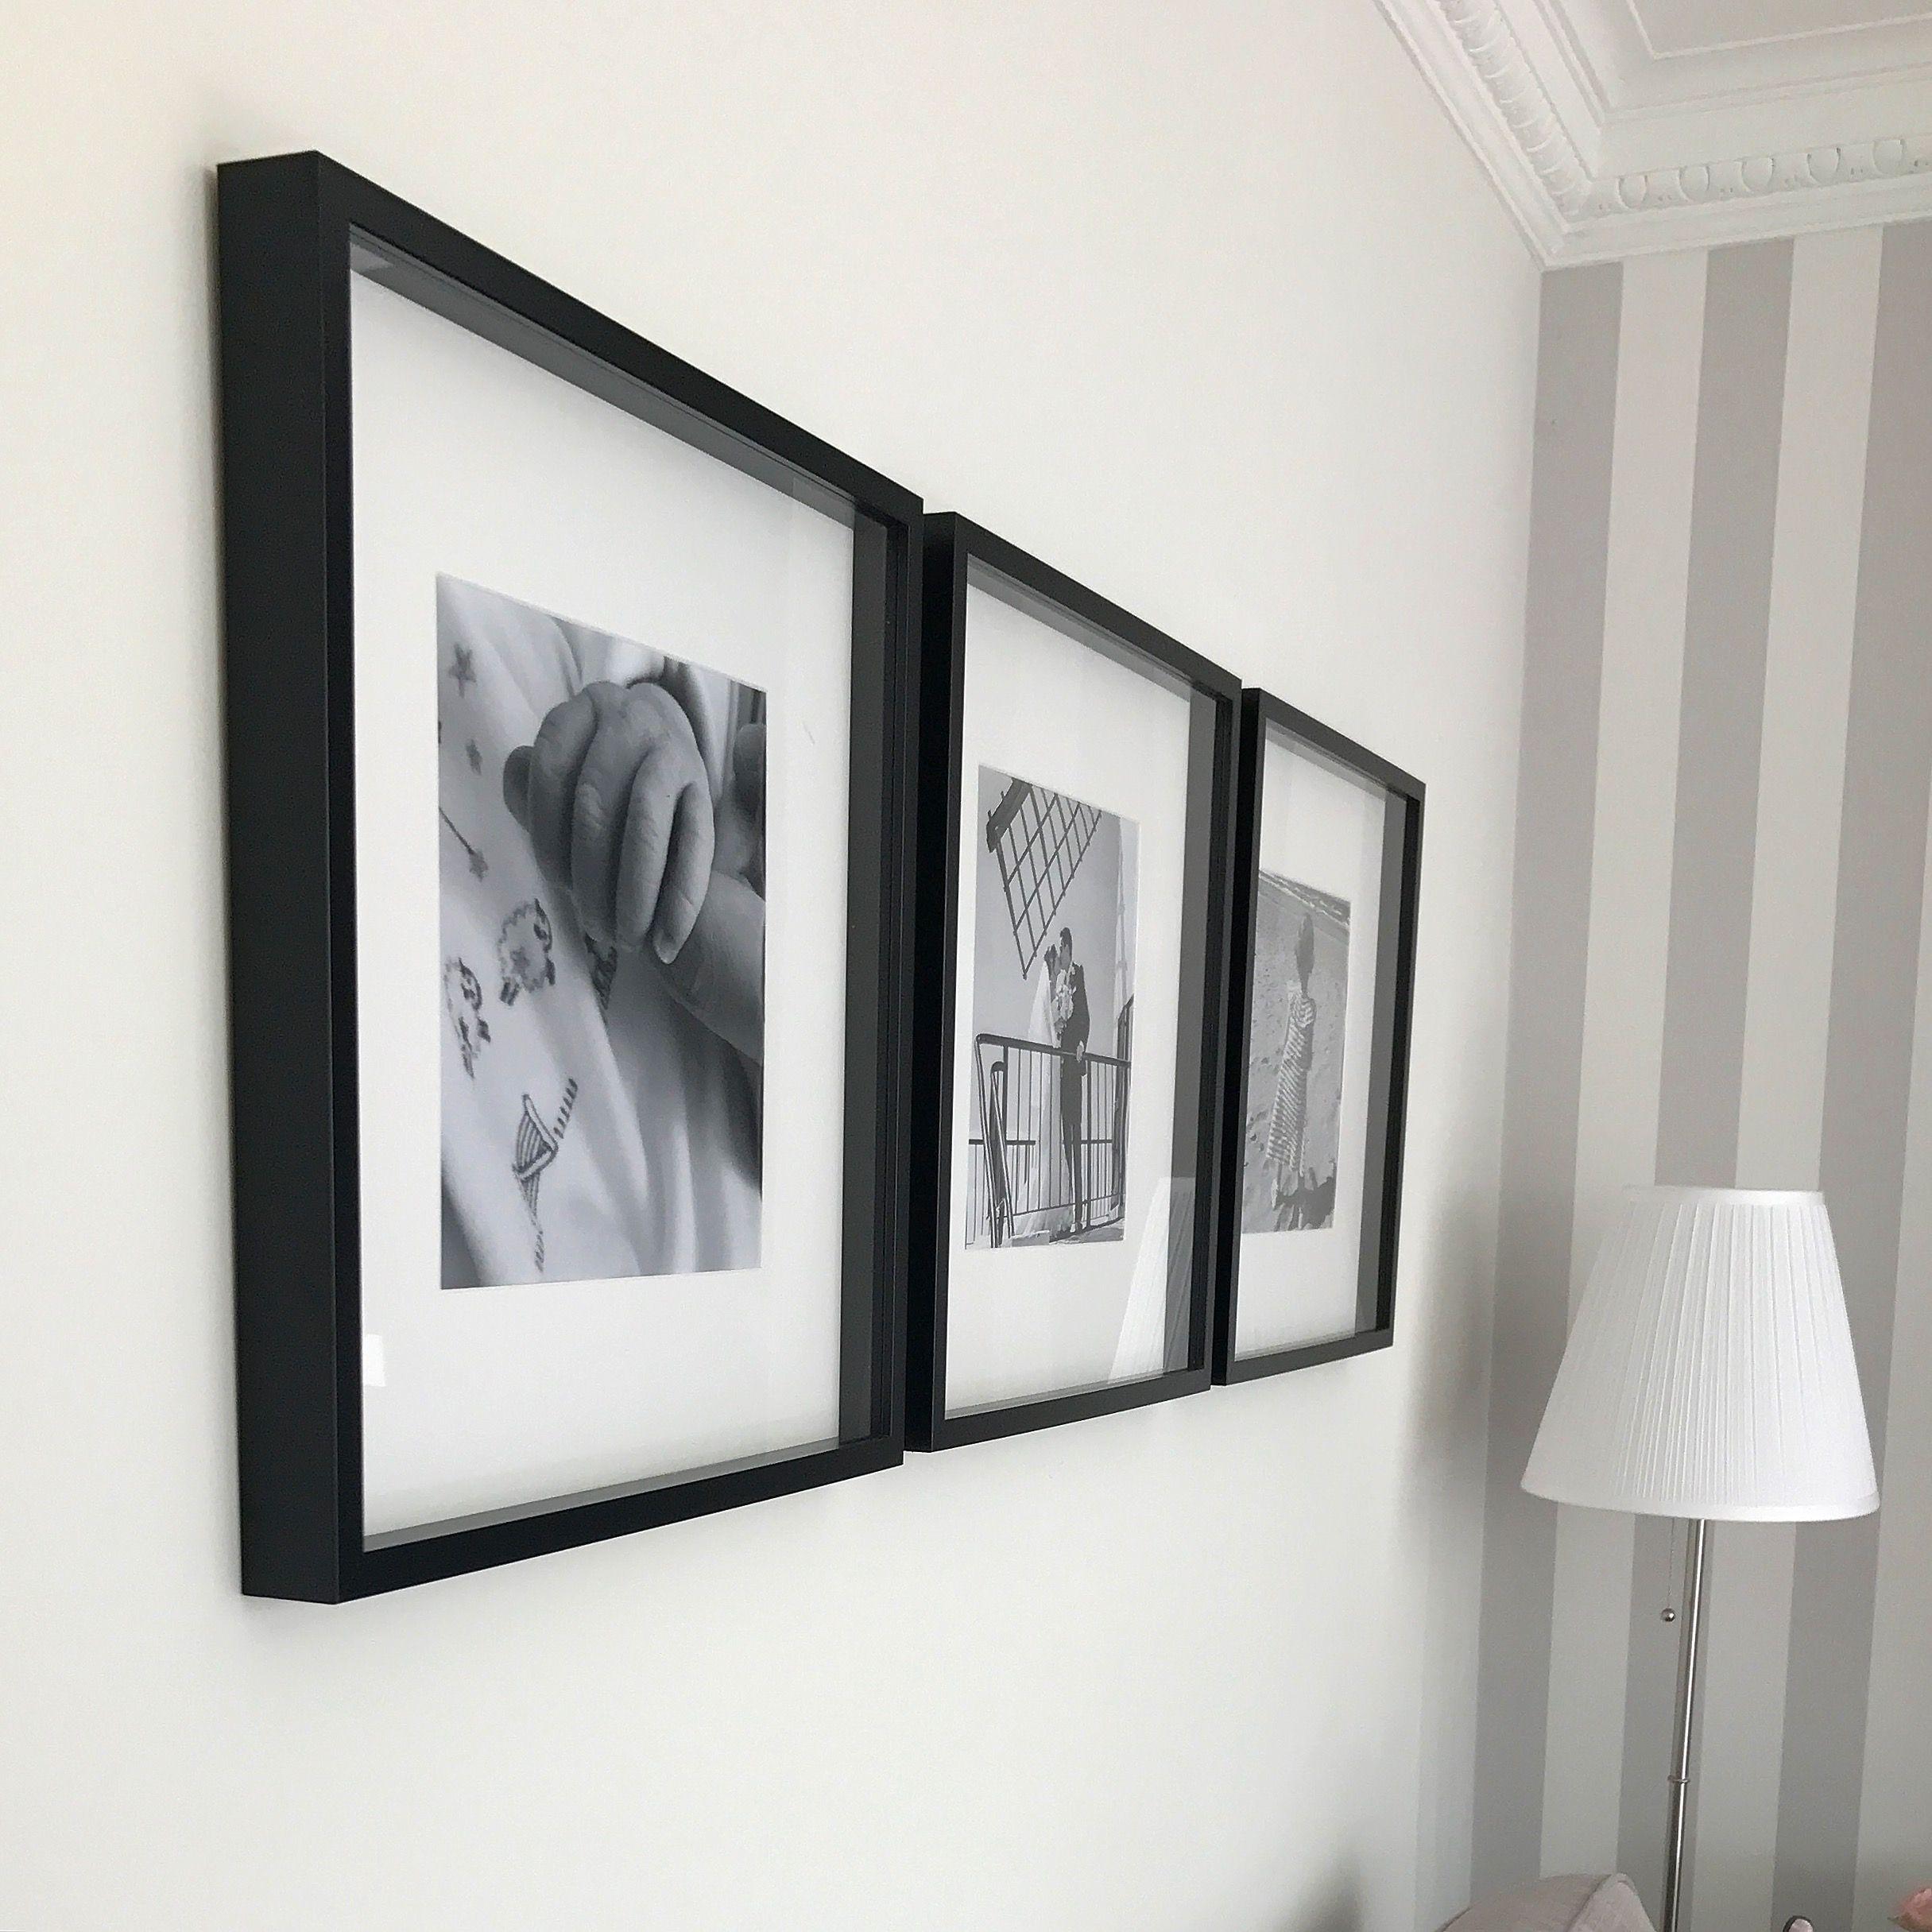 Ikea RIBBA frame 50x50 | Diğer in 2018 | Pinterest | Ribba frame ...